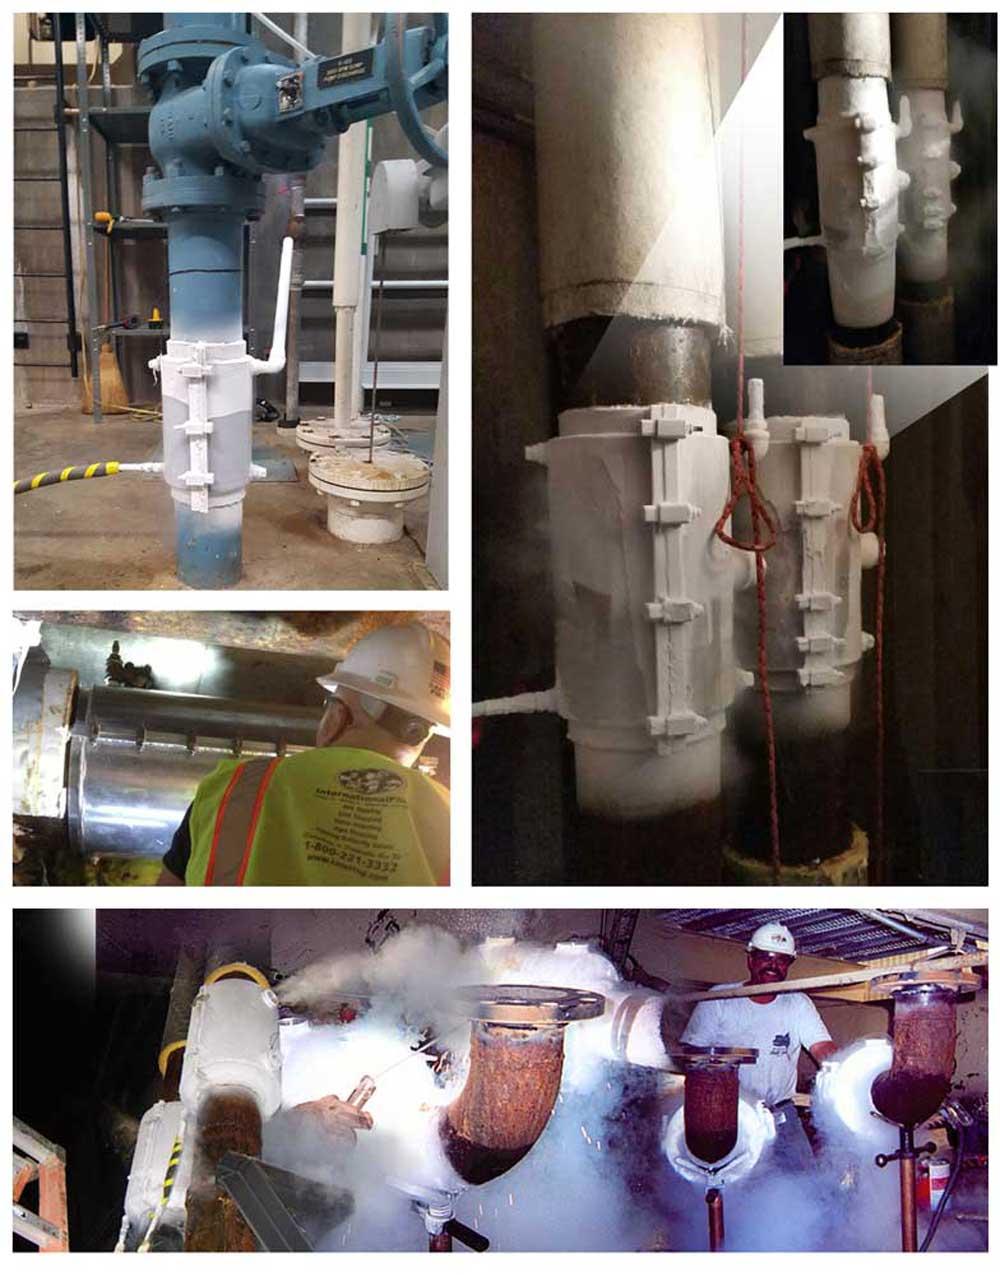 Pipeline Freeze Plugs Using Liquid Nitrogen Services